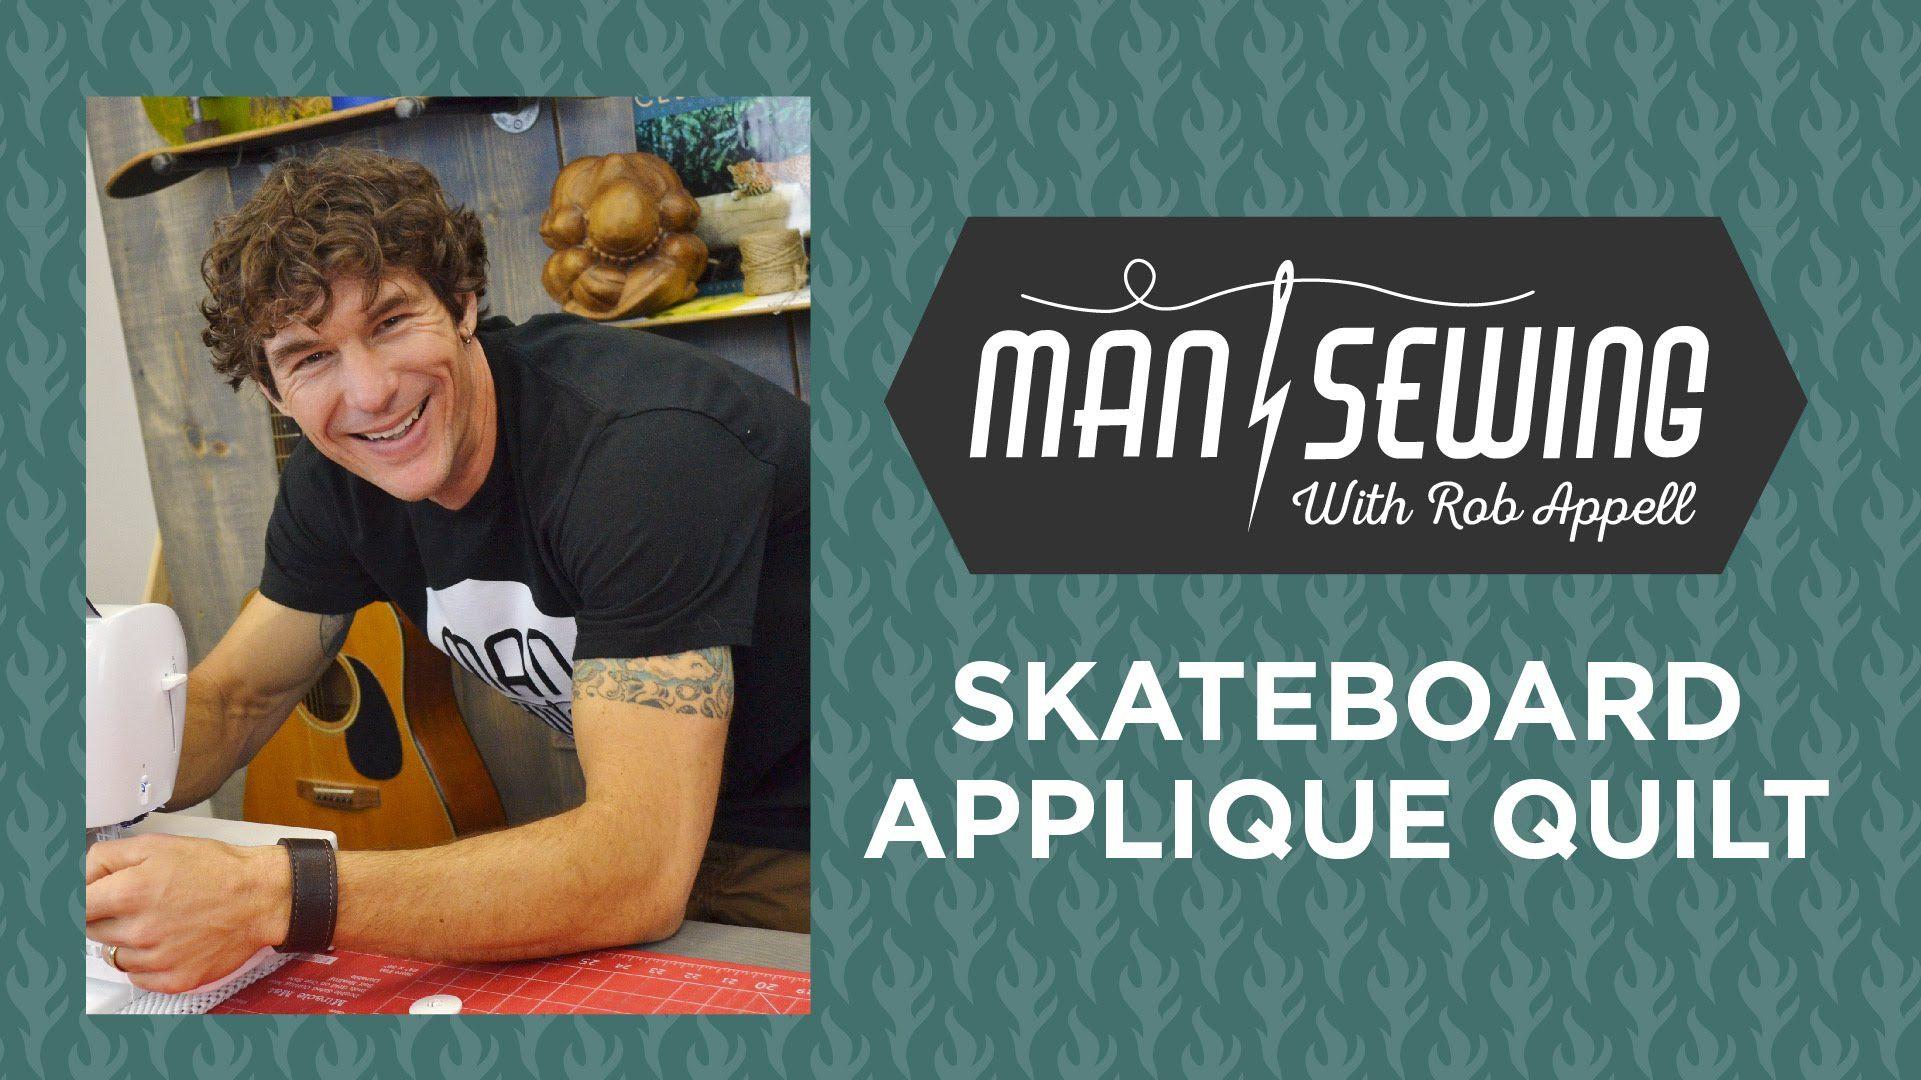 Skateboard Applique Applique Quilt Tutorial For Beginners